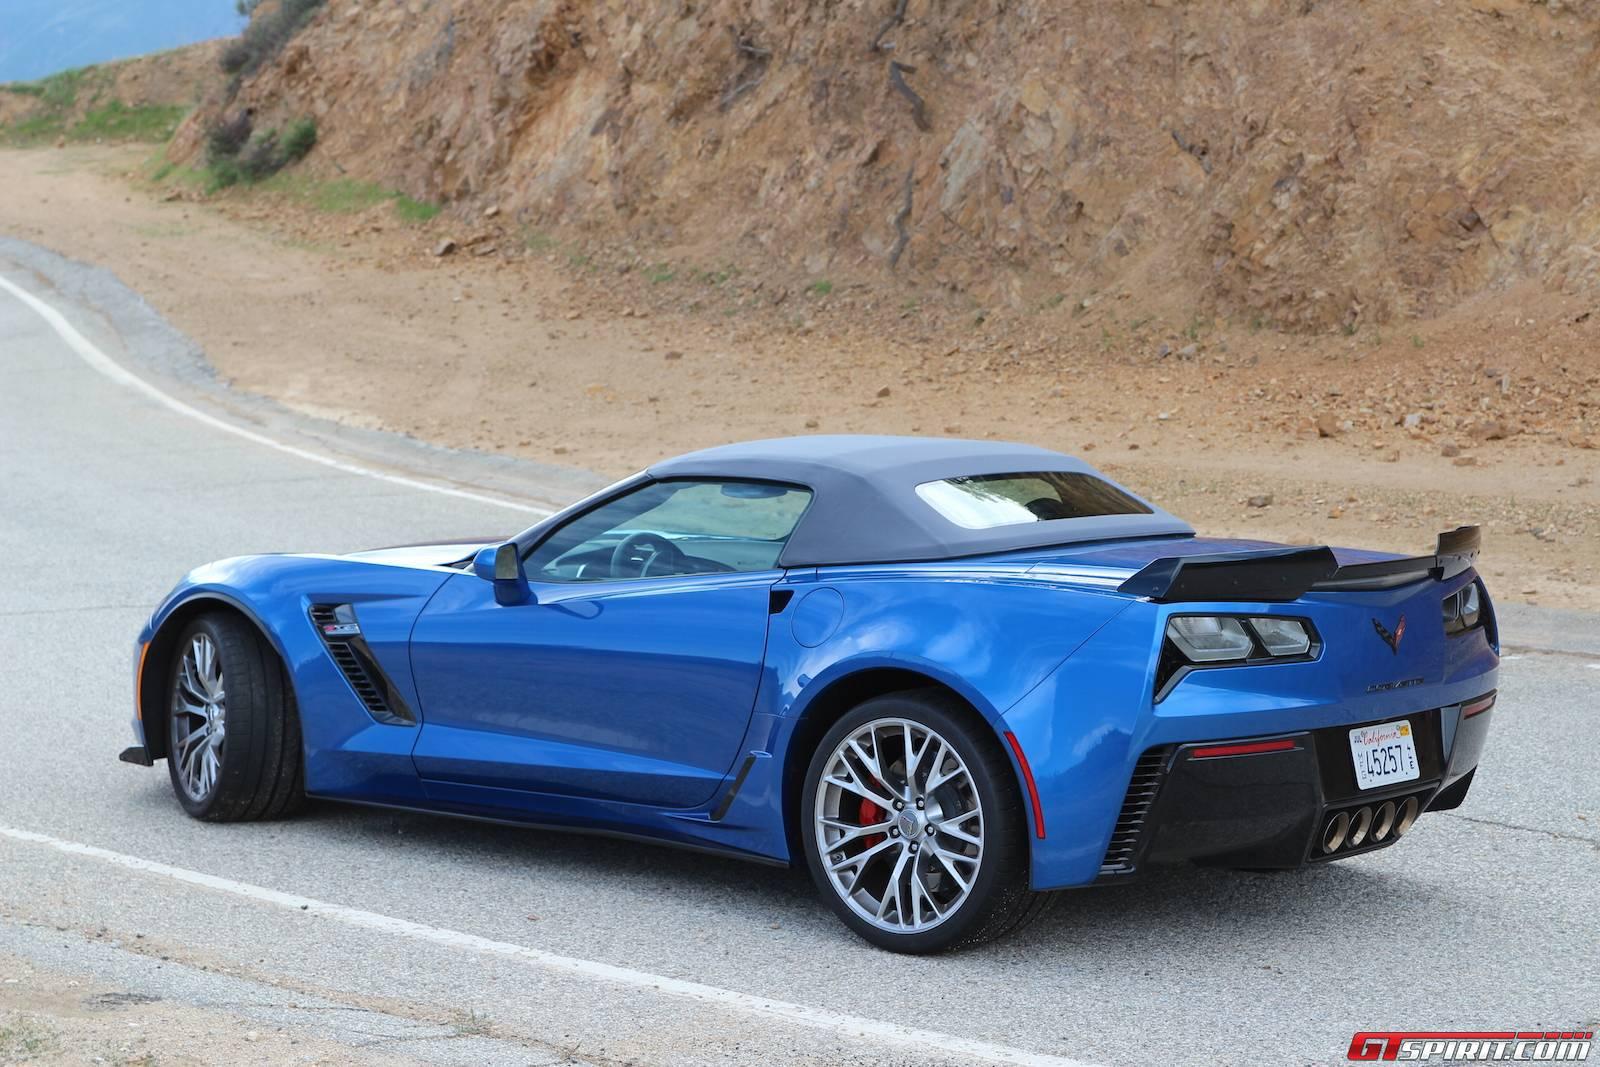 2015 chevrolet corvette z06 convertible review gtspirit. Black Bedroom Furniture Sets. Home Design Ideas